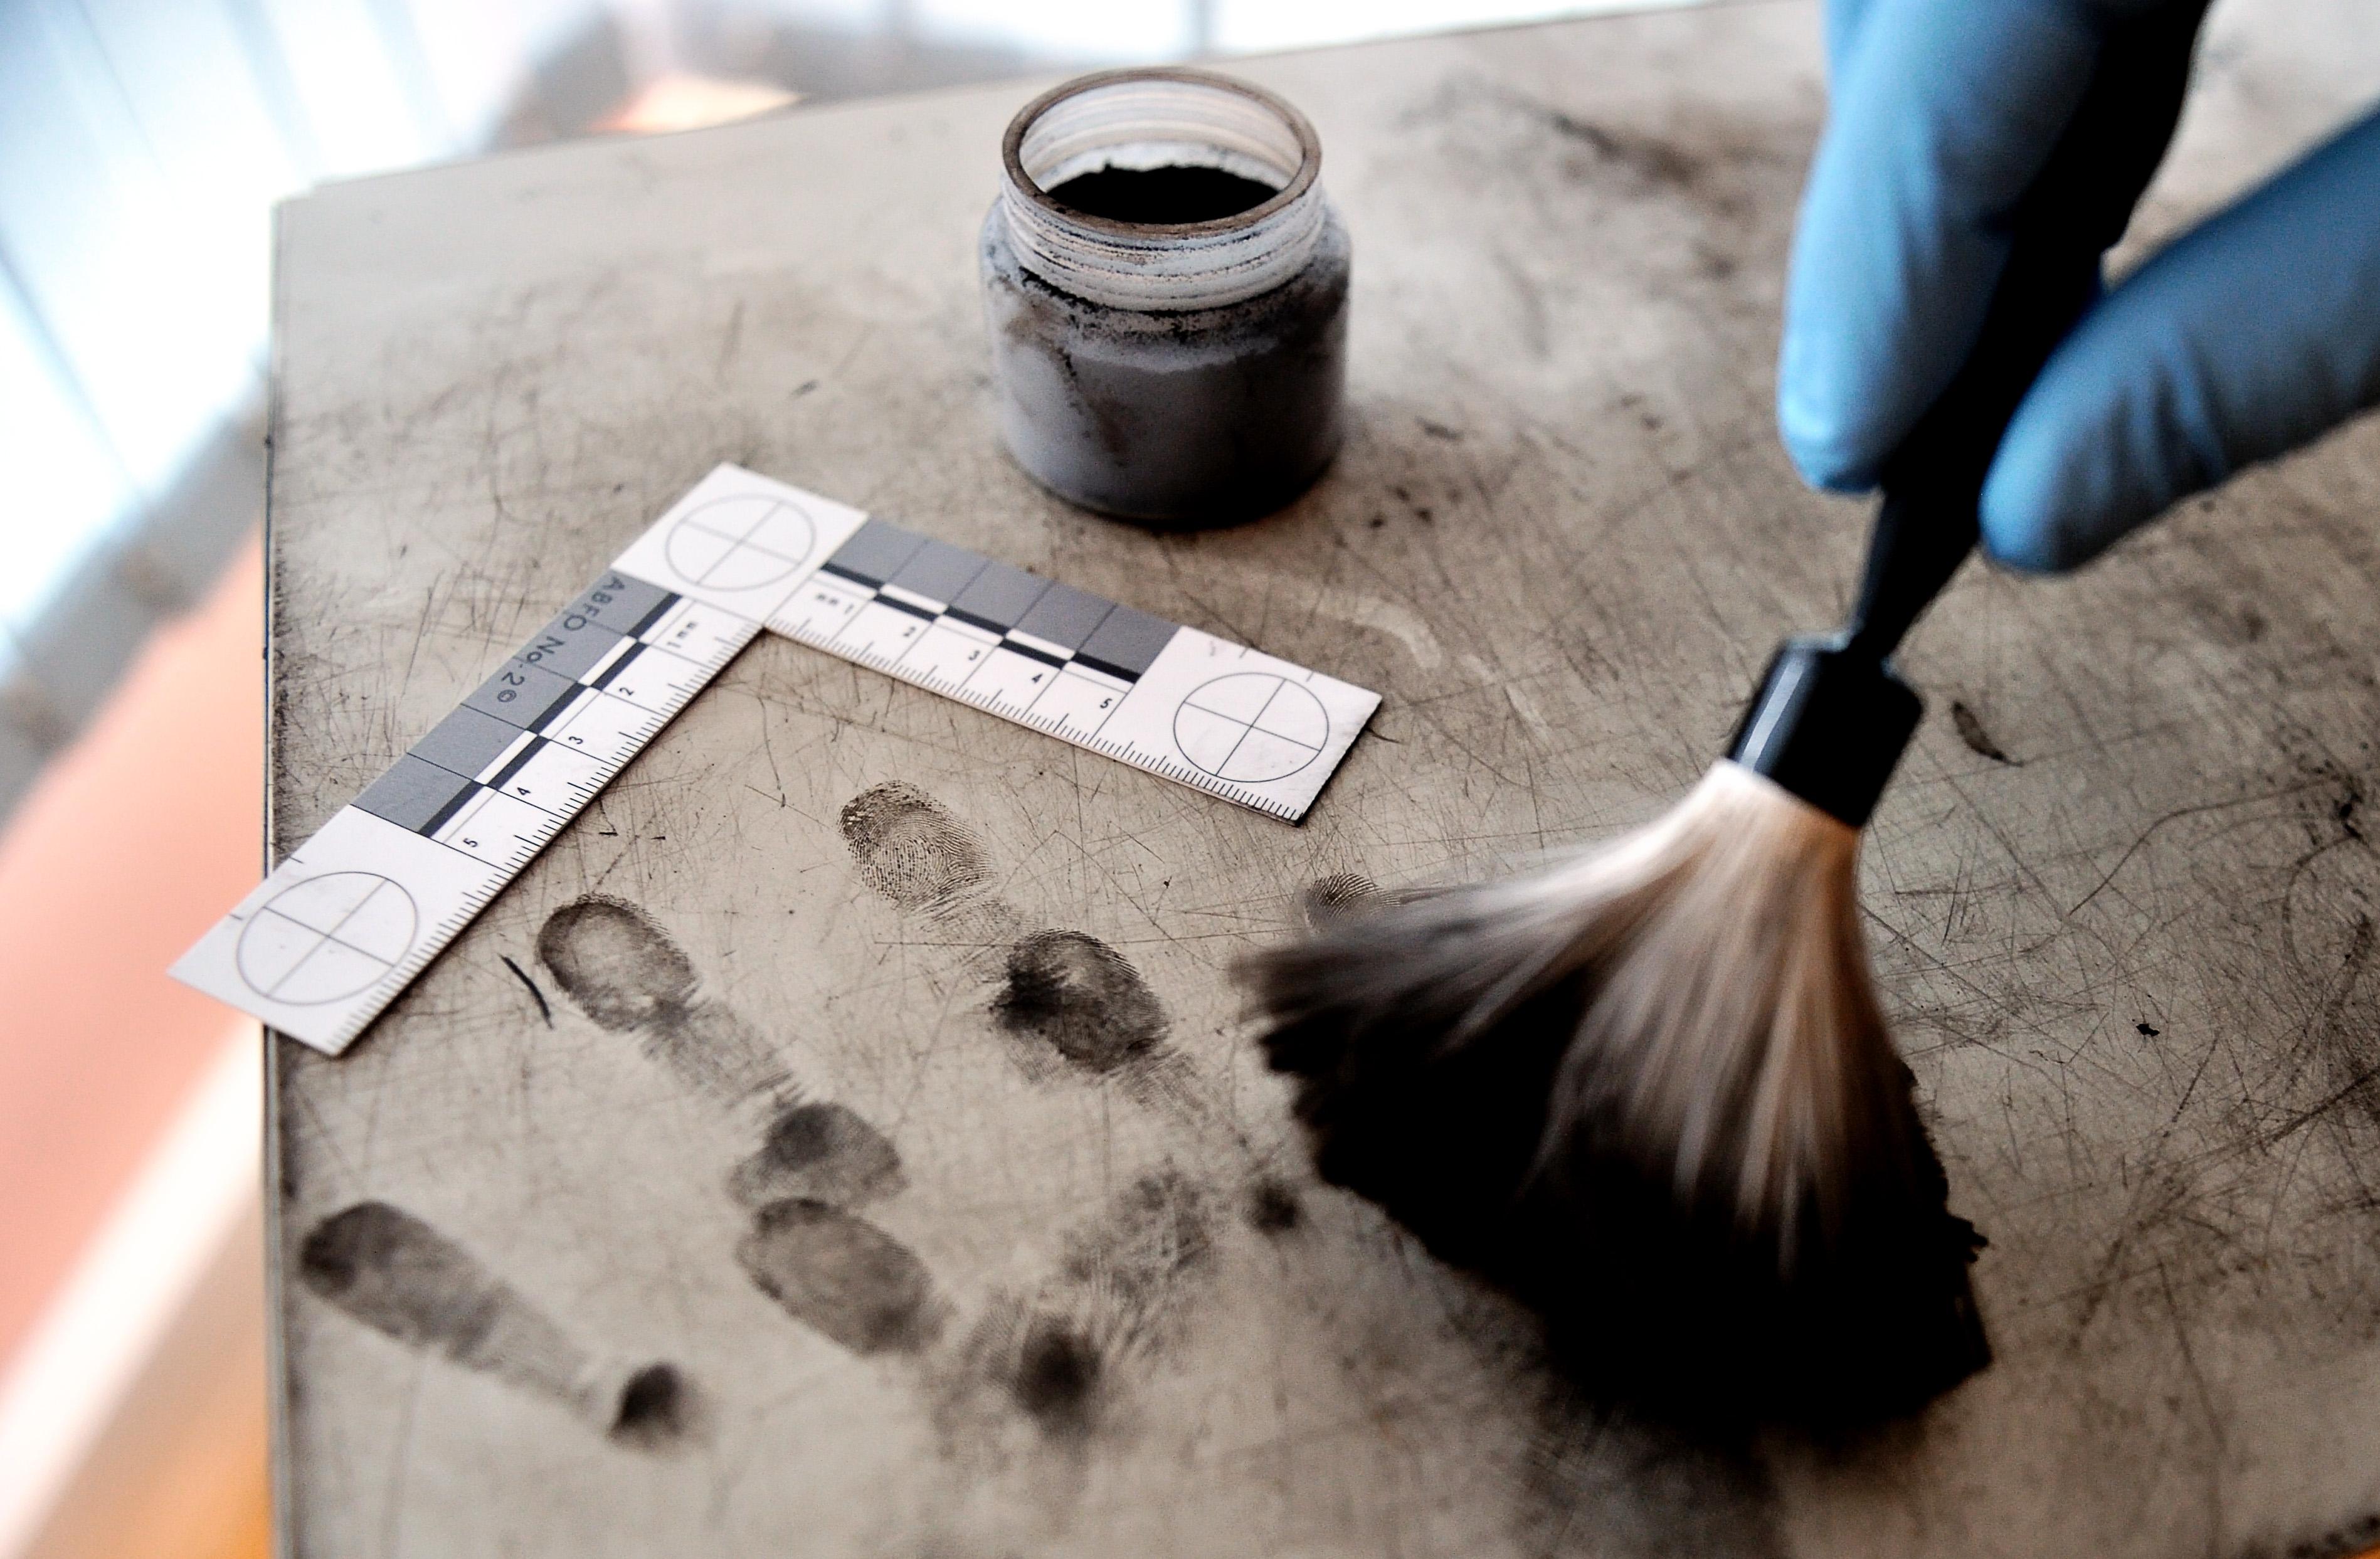 Burglars Adopt New Methods Zululand Observer